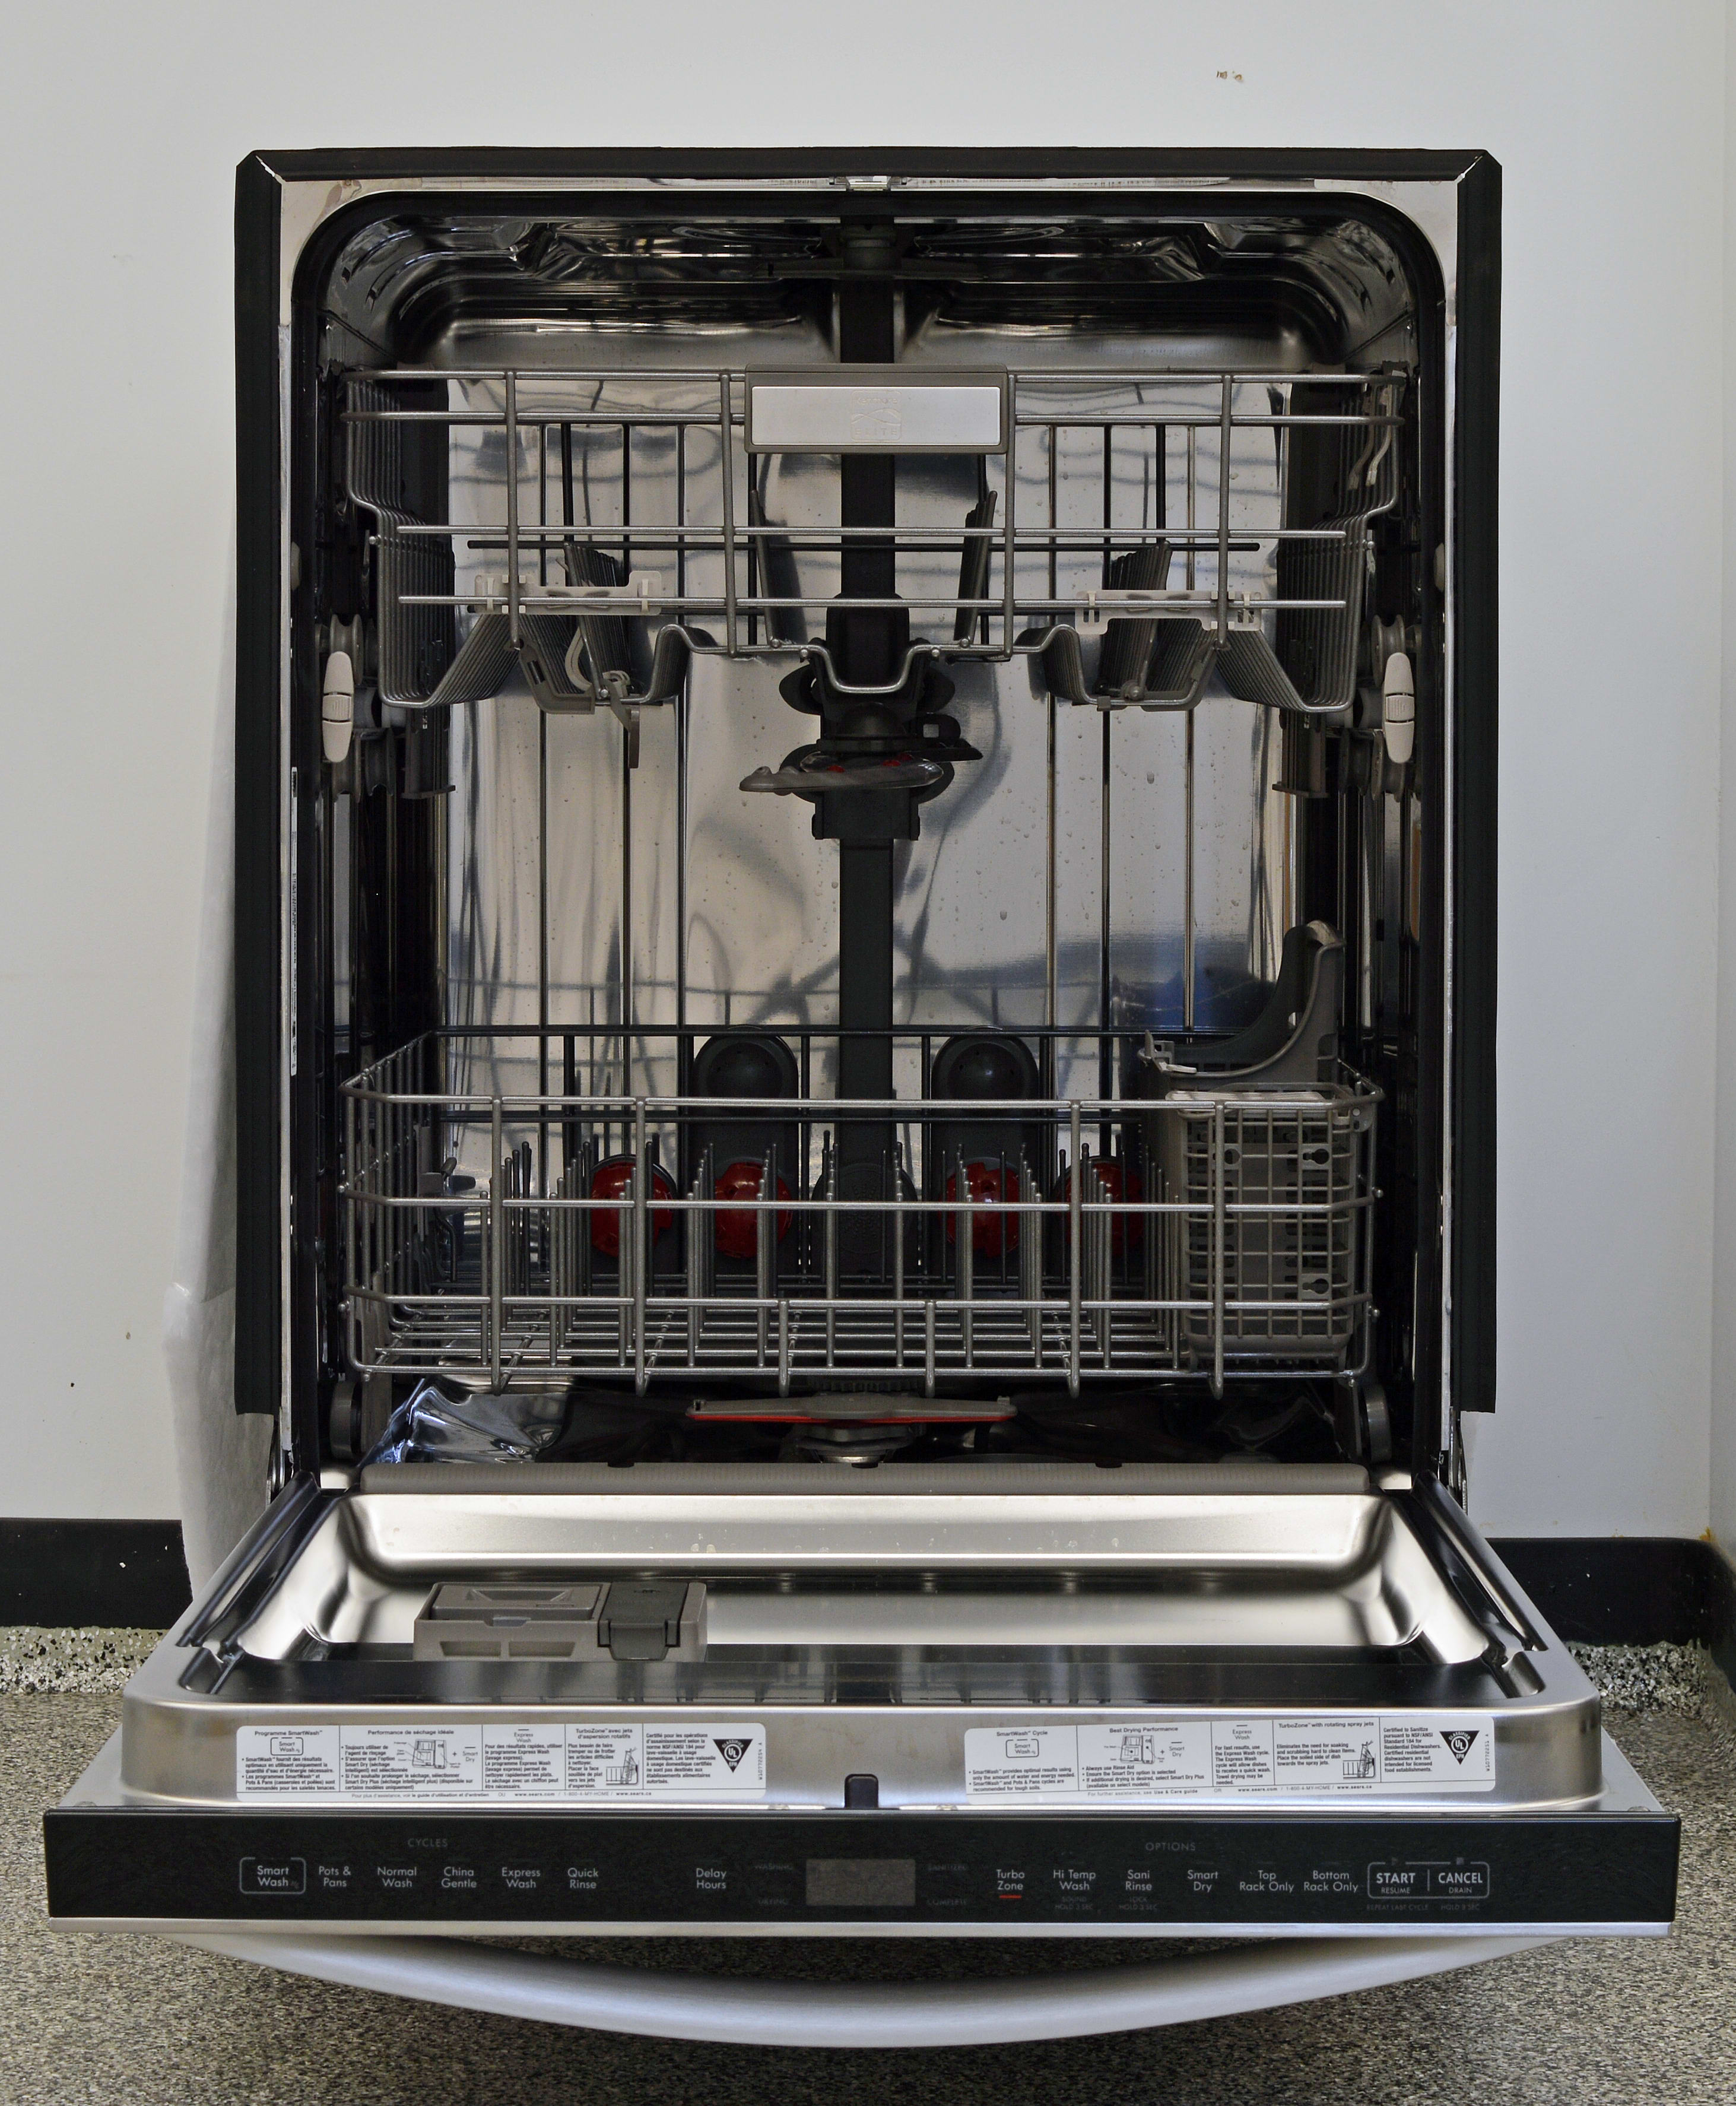 Kenmore Elite 14753 Dishwasher Review Reviewed Com